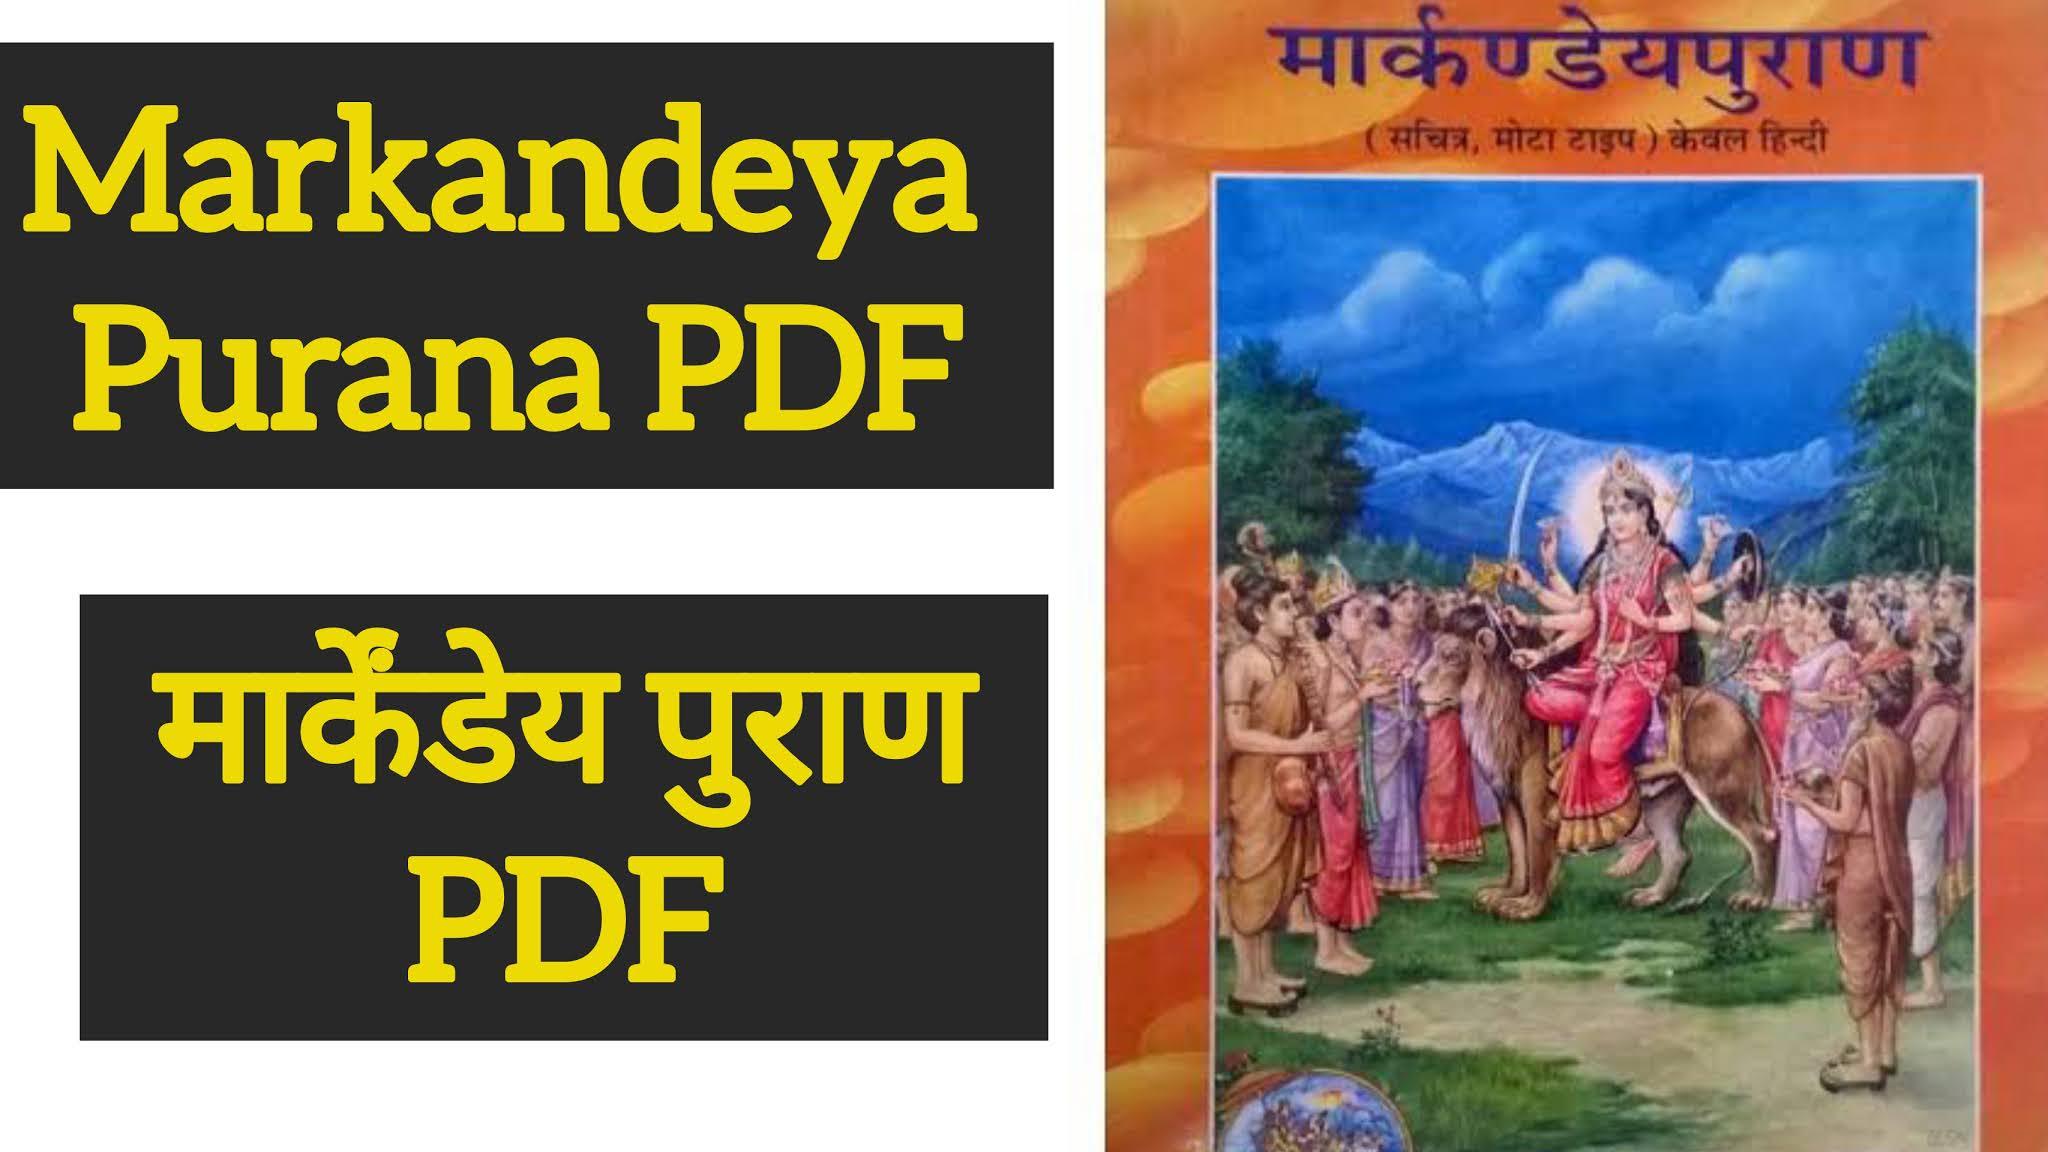 Markandeya Purana ( मार्कण्डेय पुराण ) PDF